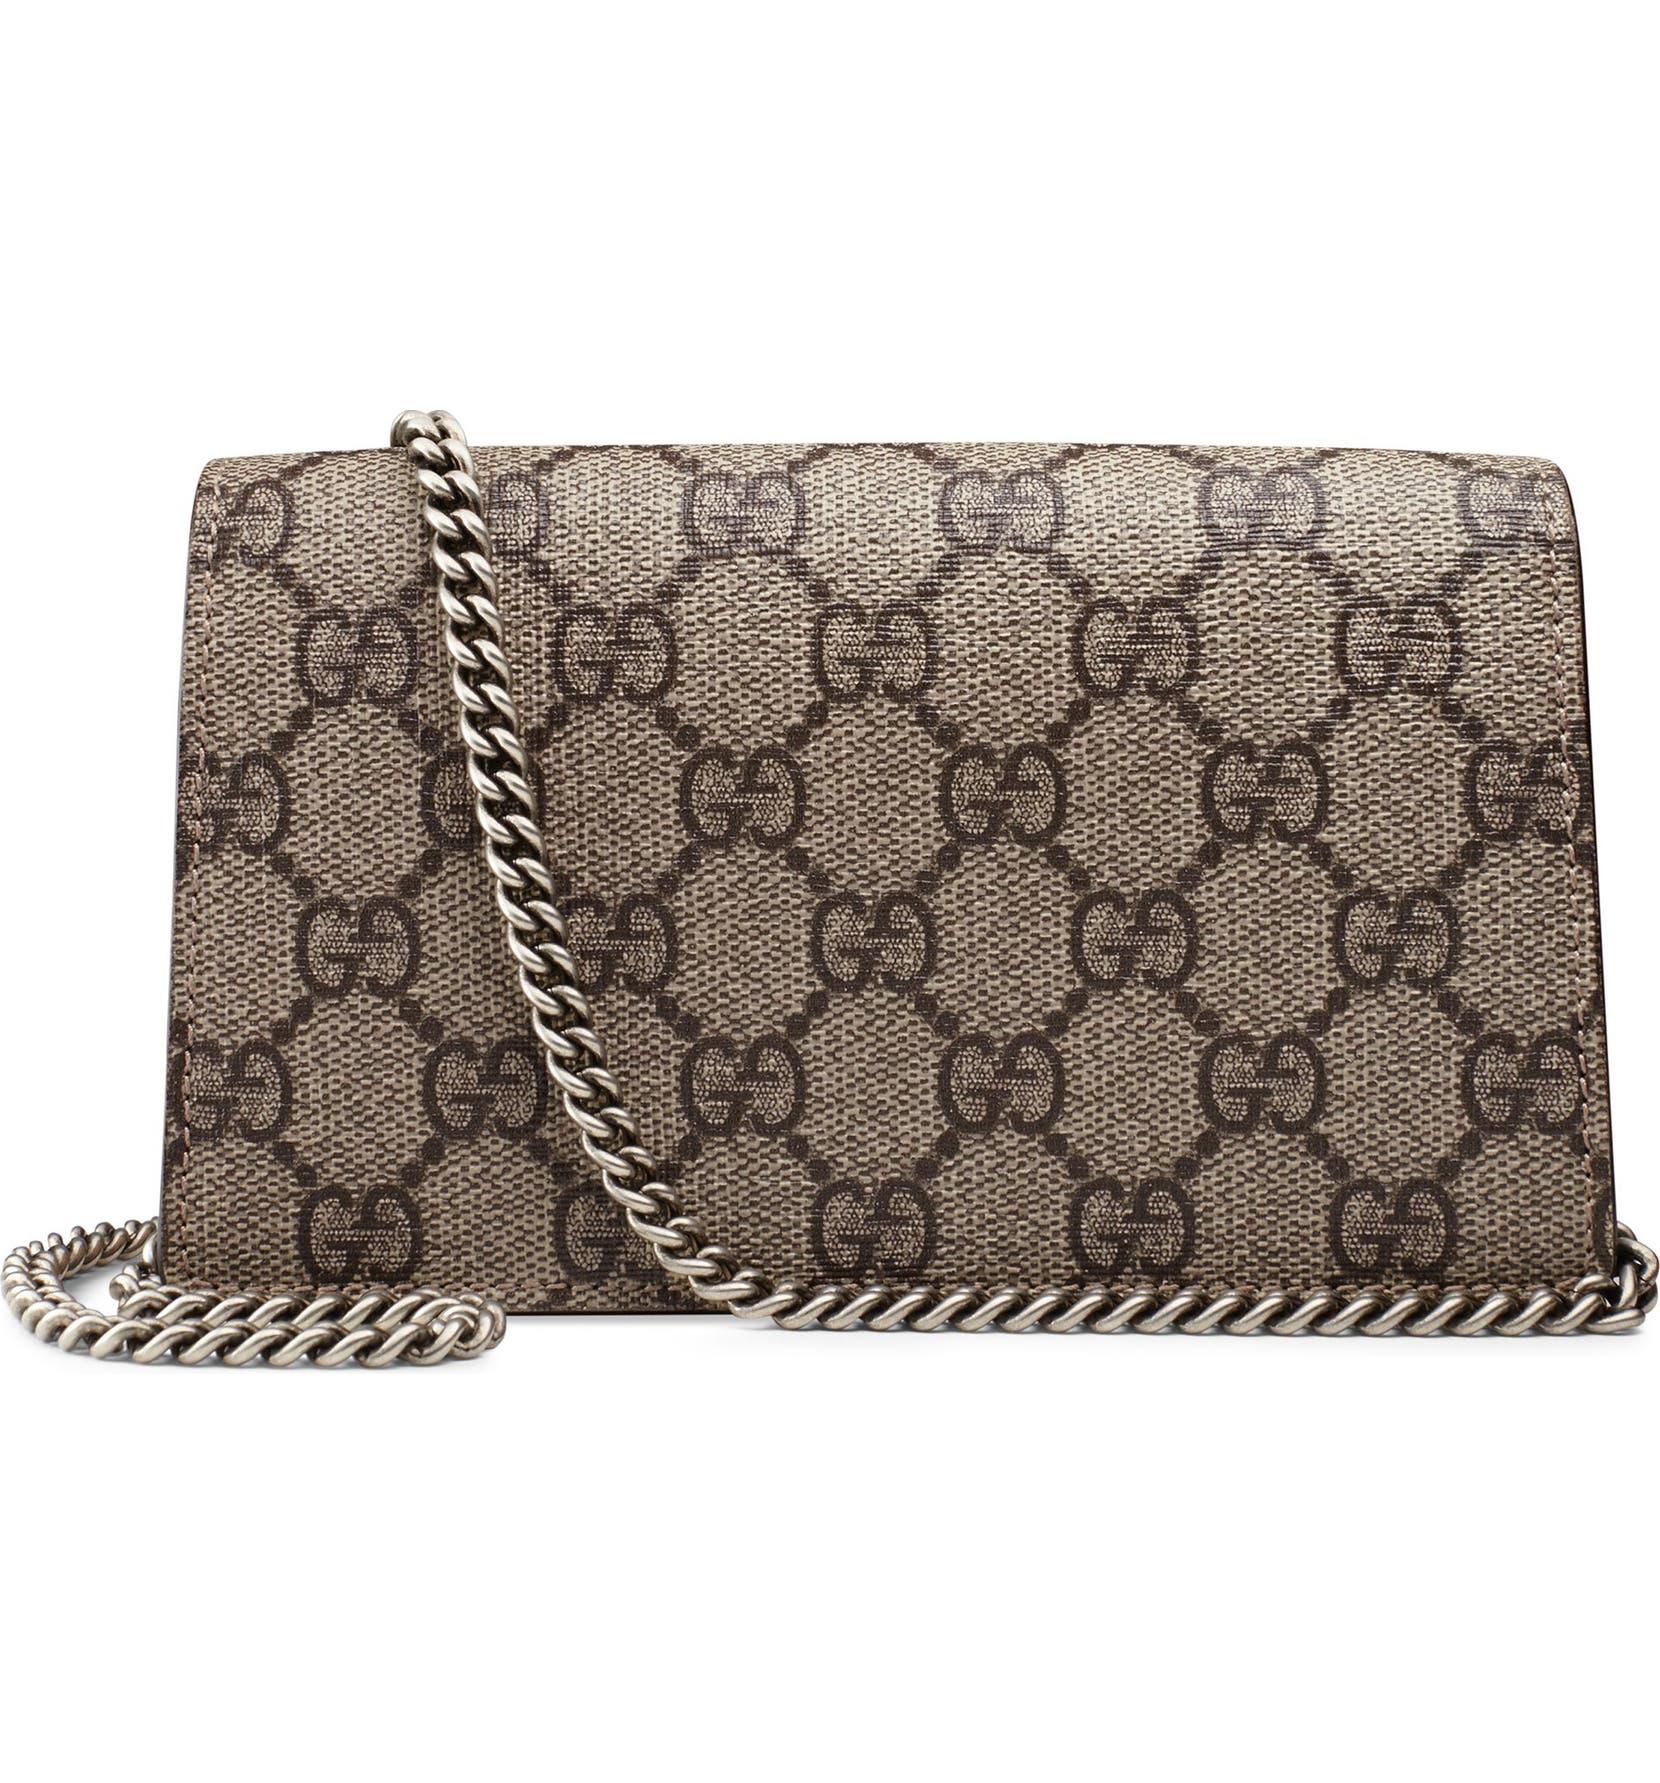 6abbca87fb10 Gucci Super Mini Dionysus GG Supreme Canvas & Suede Shoulder Bag | Nordstrom